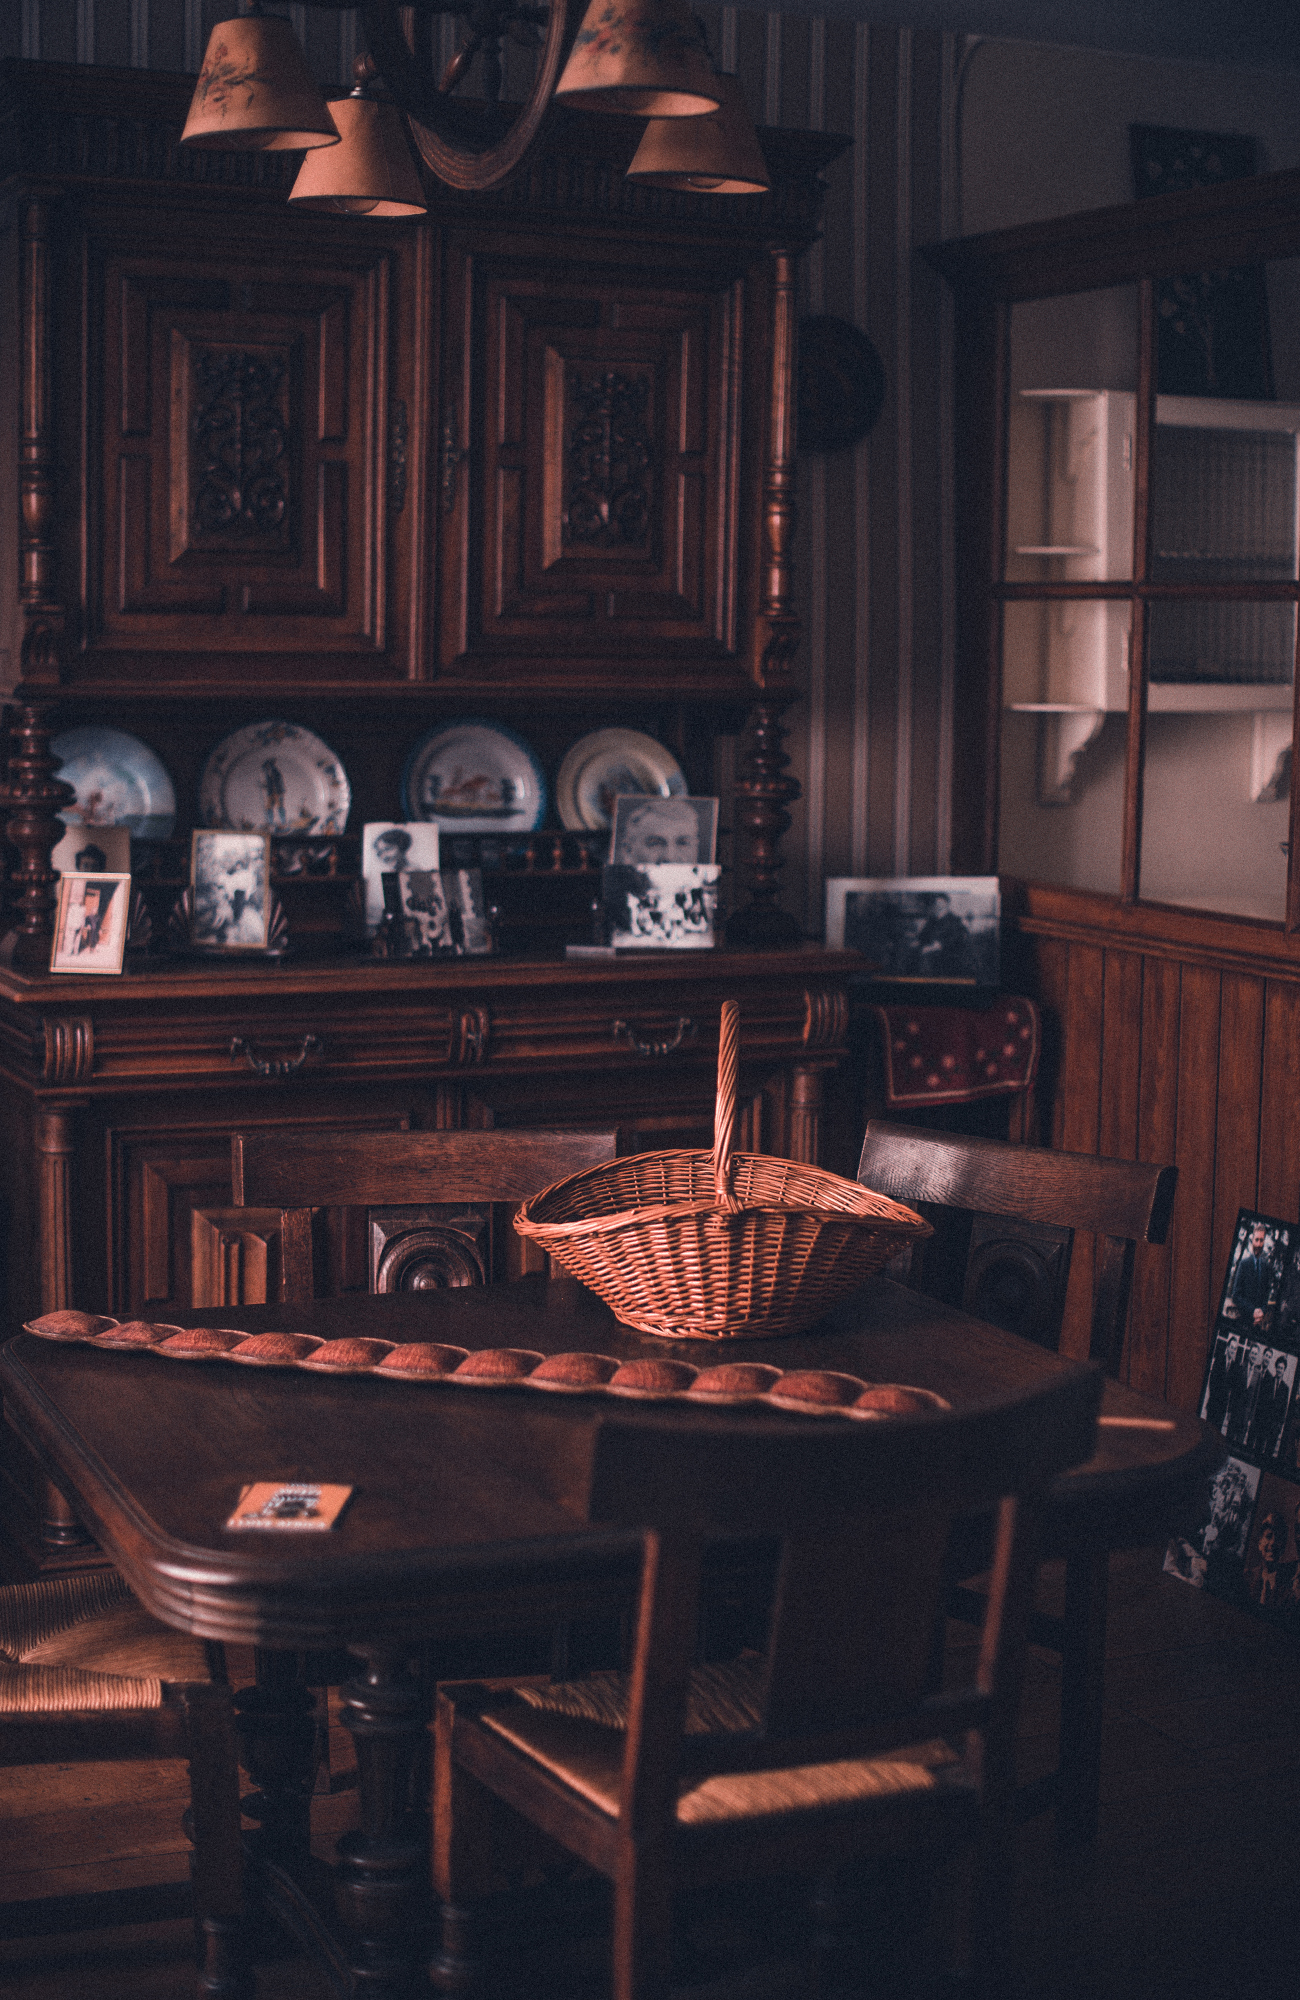 Geburtshaus Yves Rocher la gacilly frankreich lifestyle blog münchen